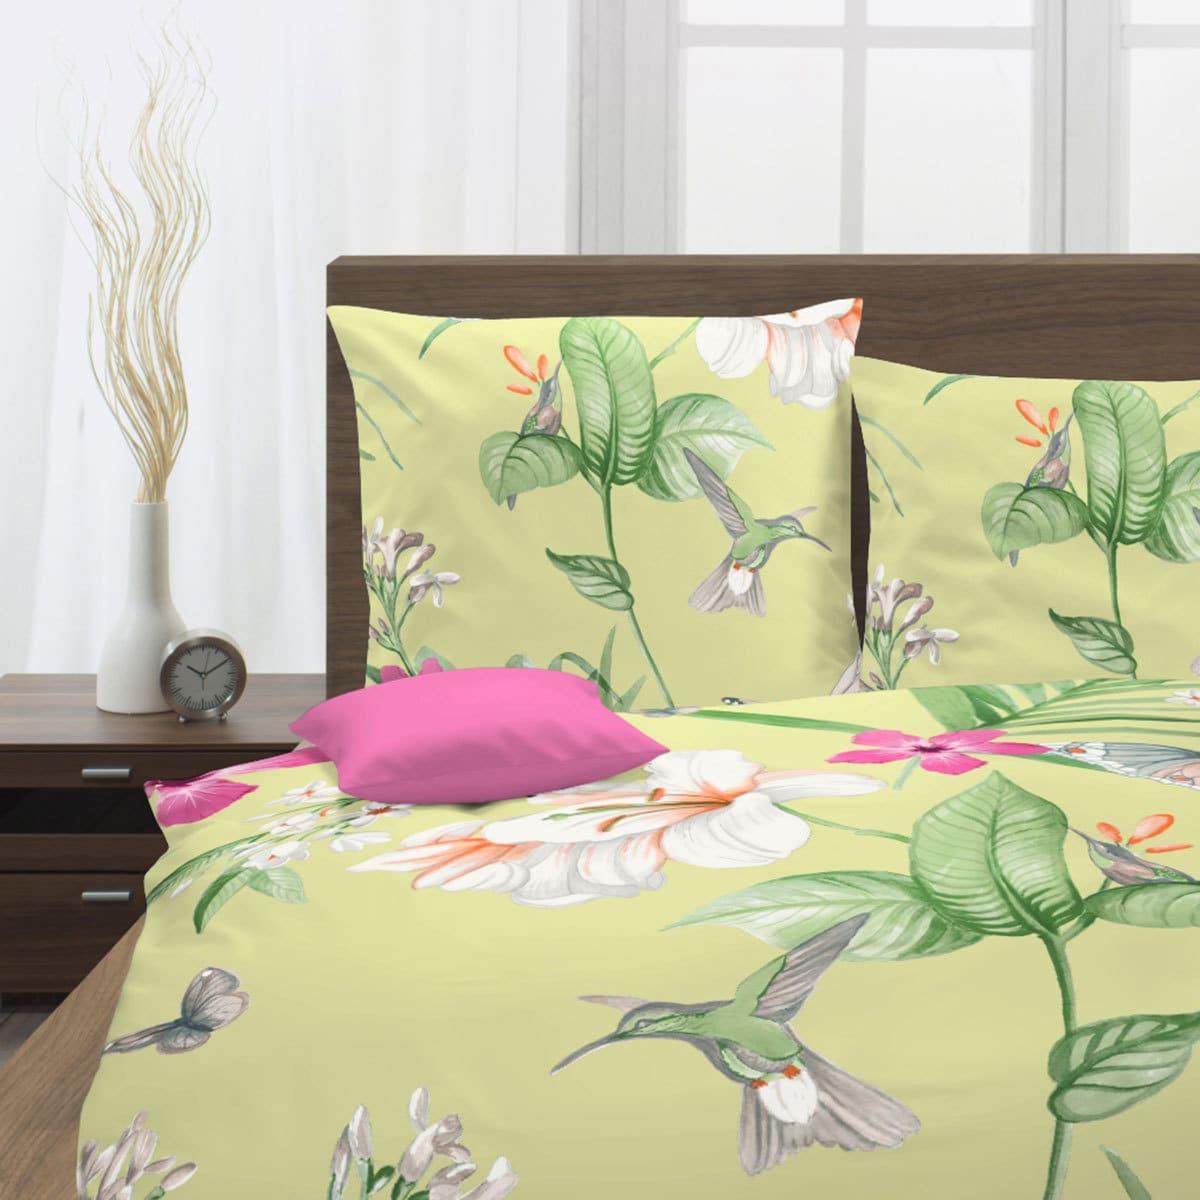 fleuresse mako satin bettw sche milano 113176 05 g nstig online kaufen bei bettwaren shop. Black Bedroom Furniture Sets. Home Design Ideas